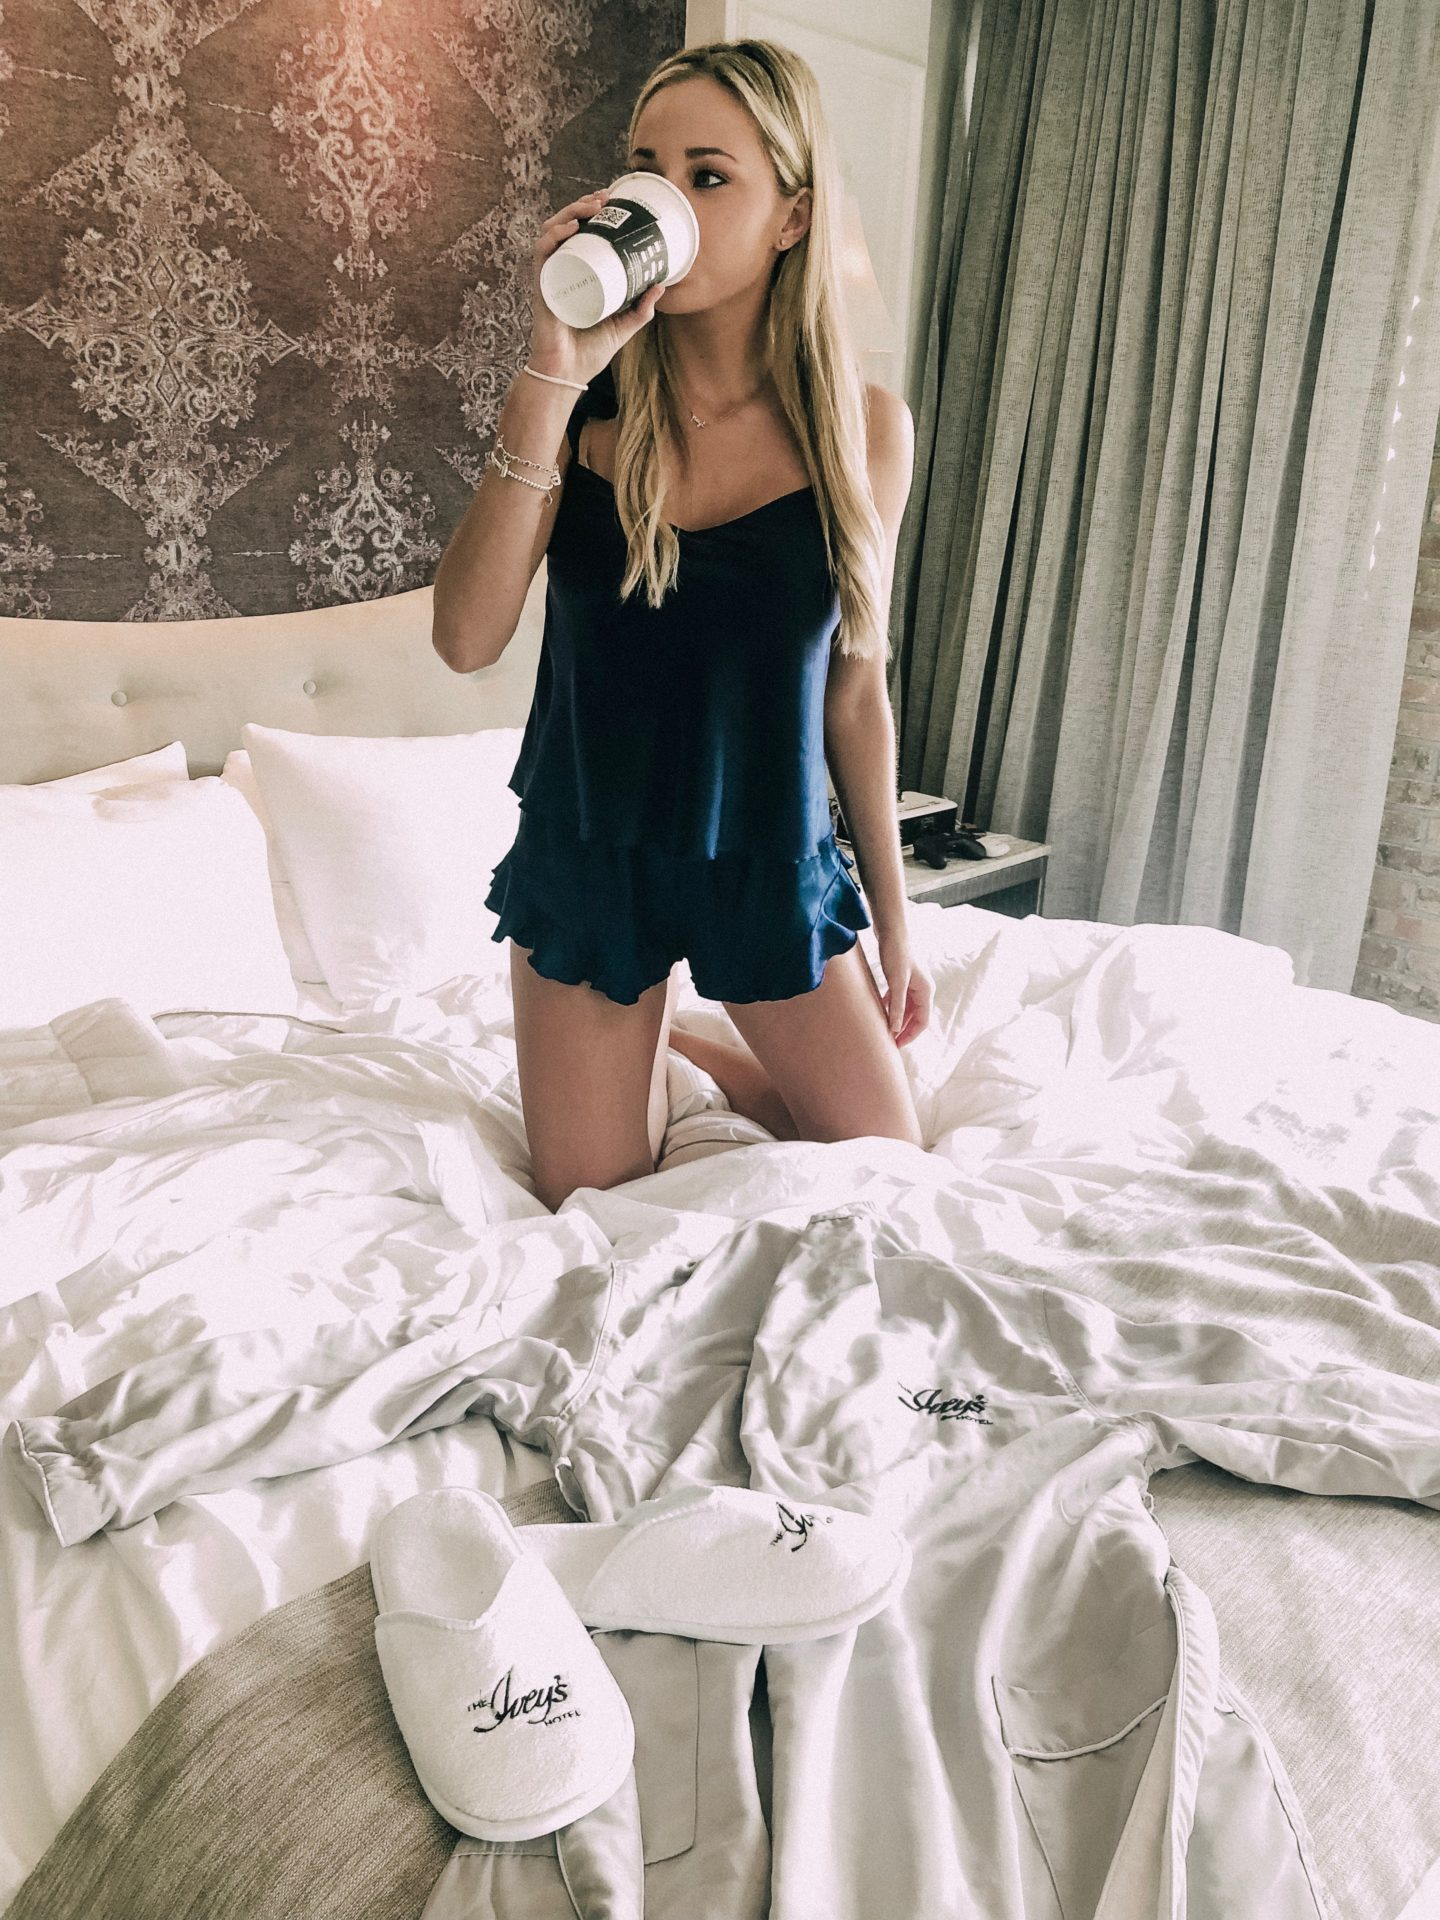 Dallas Fashion Model, Fashion & Lifestyle Blogger - Peyton Mabry